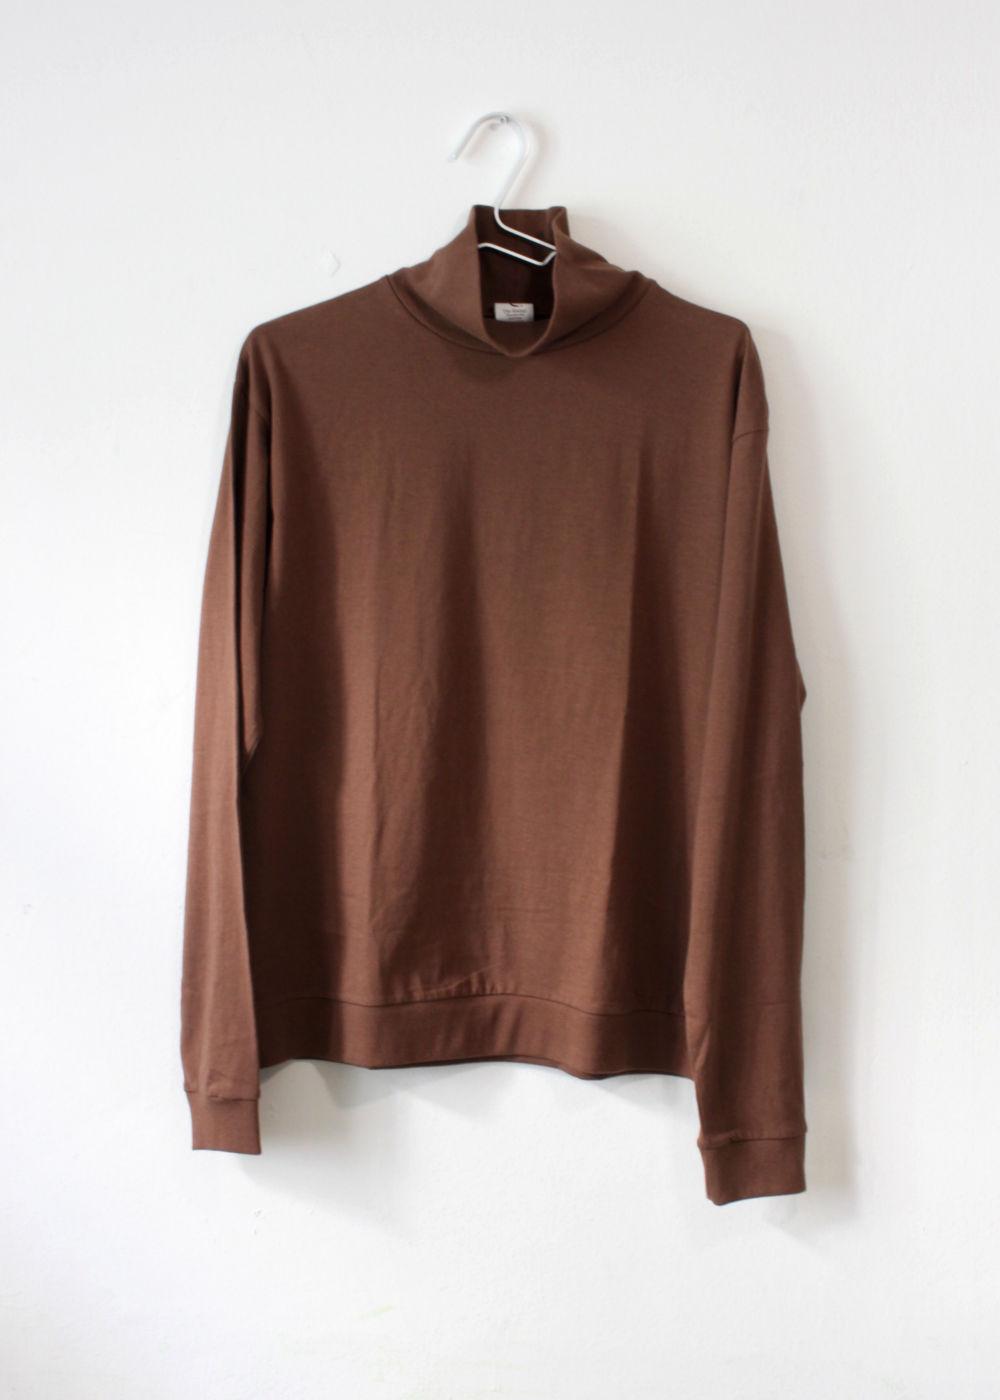 CTheHadagi-Turtleneck-Long-Sleeve-T-shirts-Brown